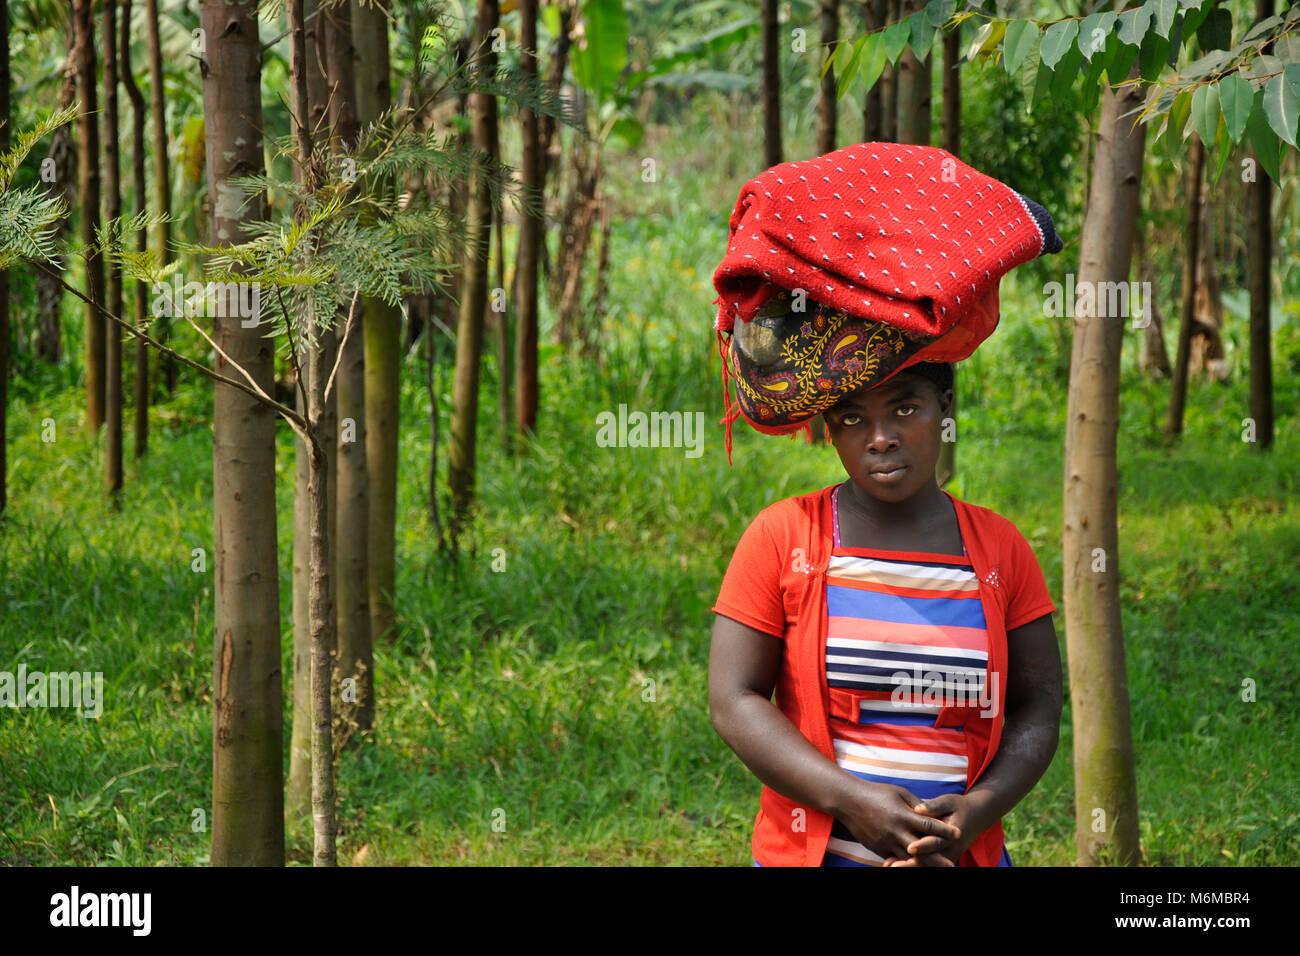 Democratic Republic of Congo, Village near Virunga National Park - Stock Image